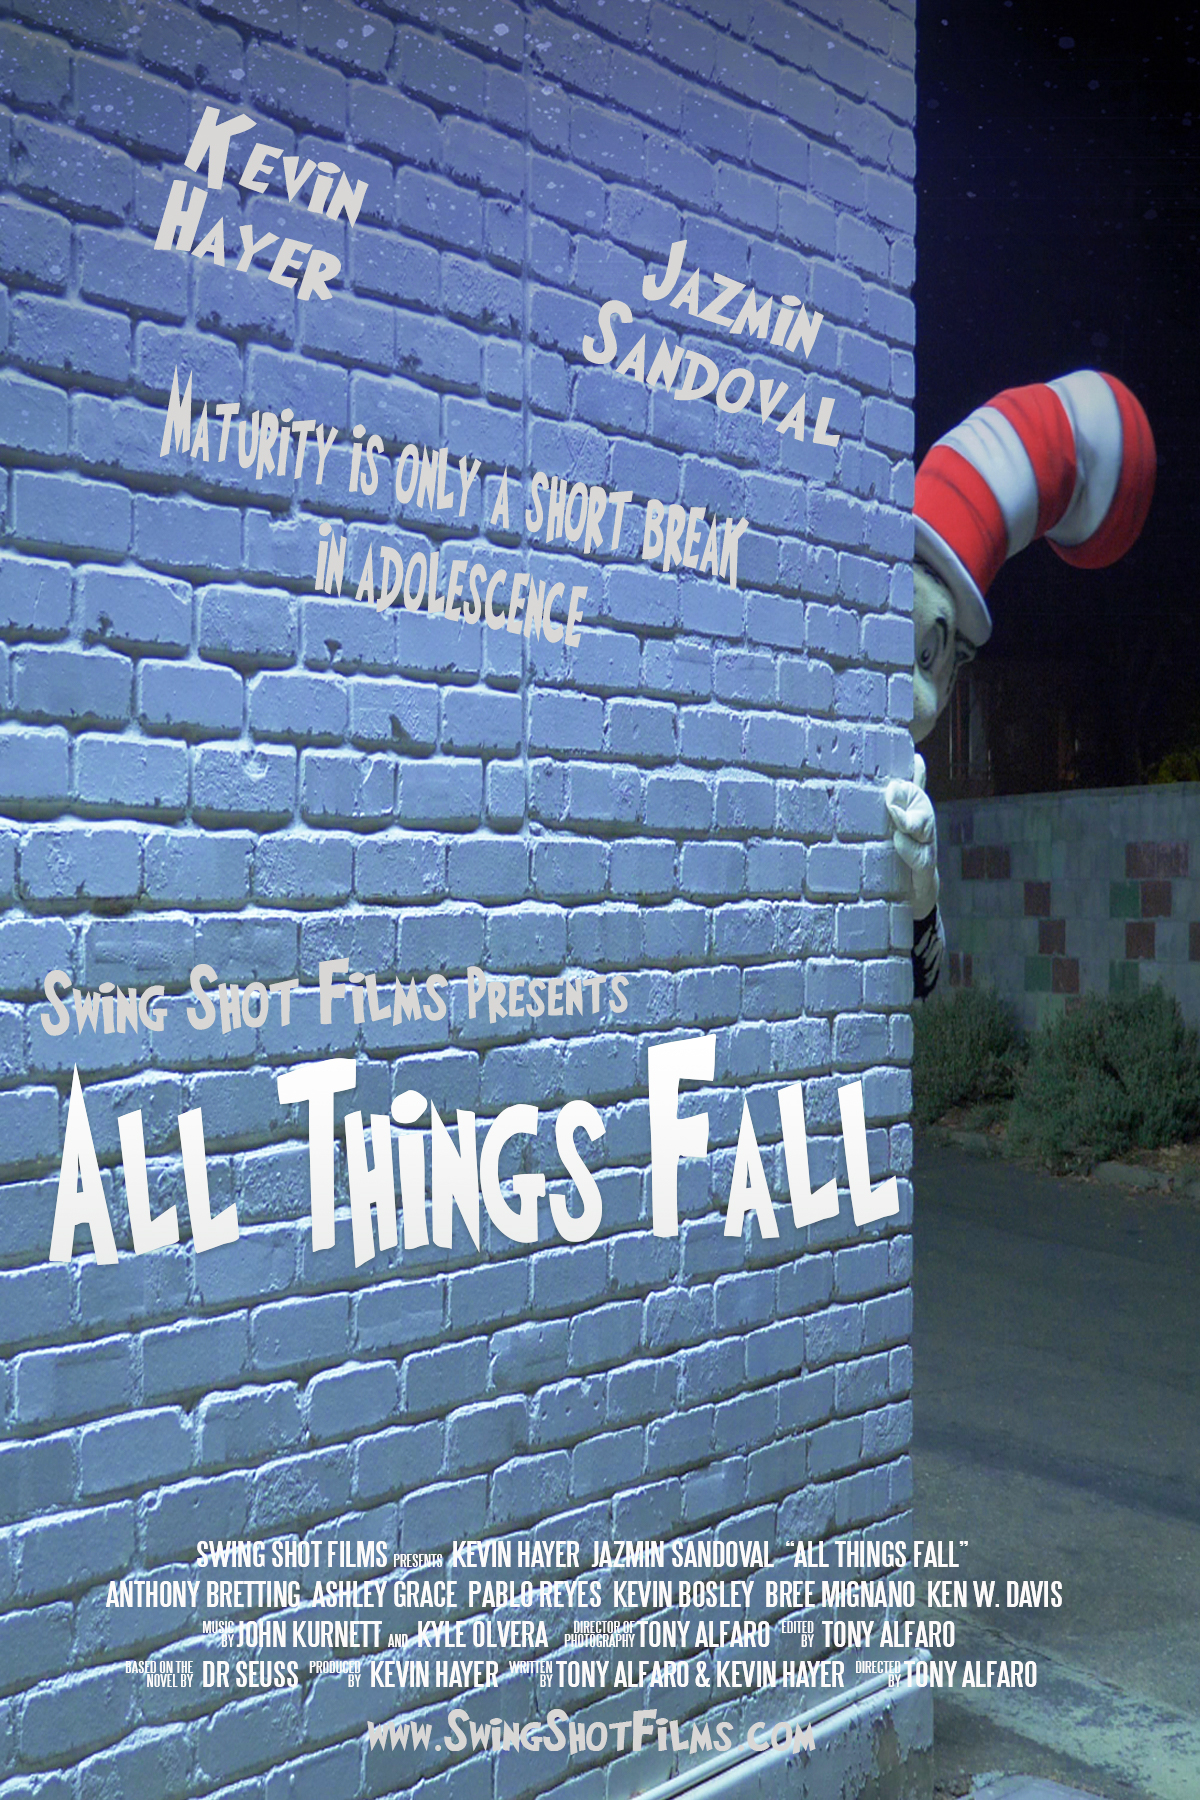 All Things Fall - Poster 2 (Rough).jpg